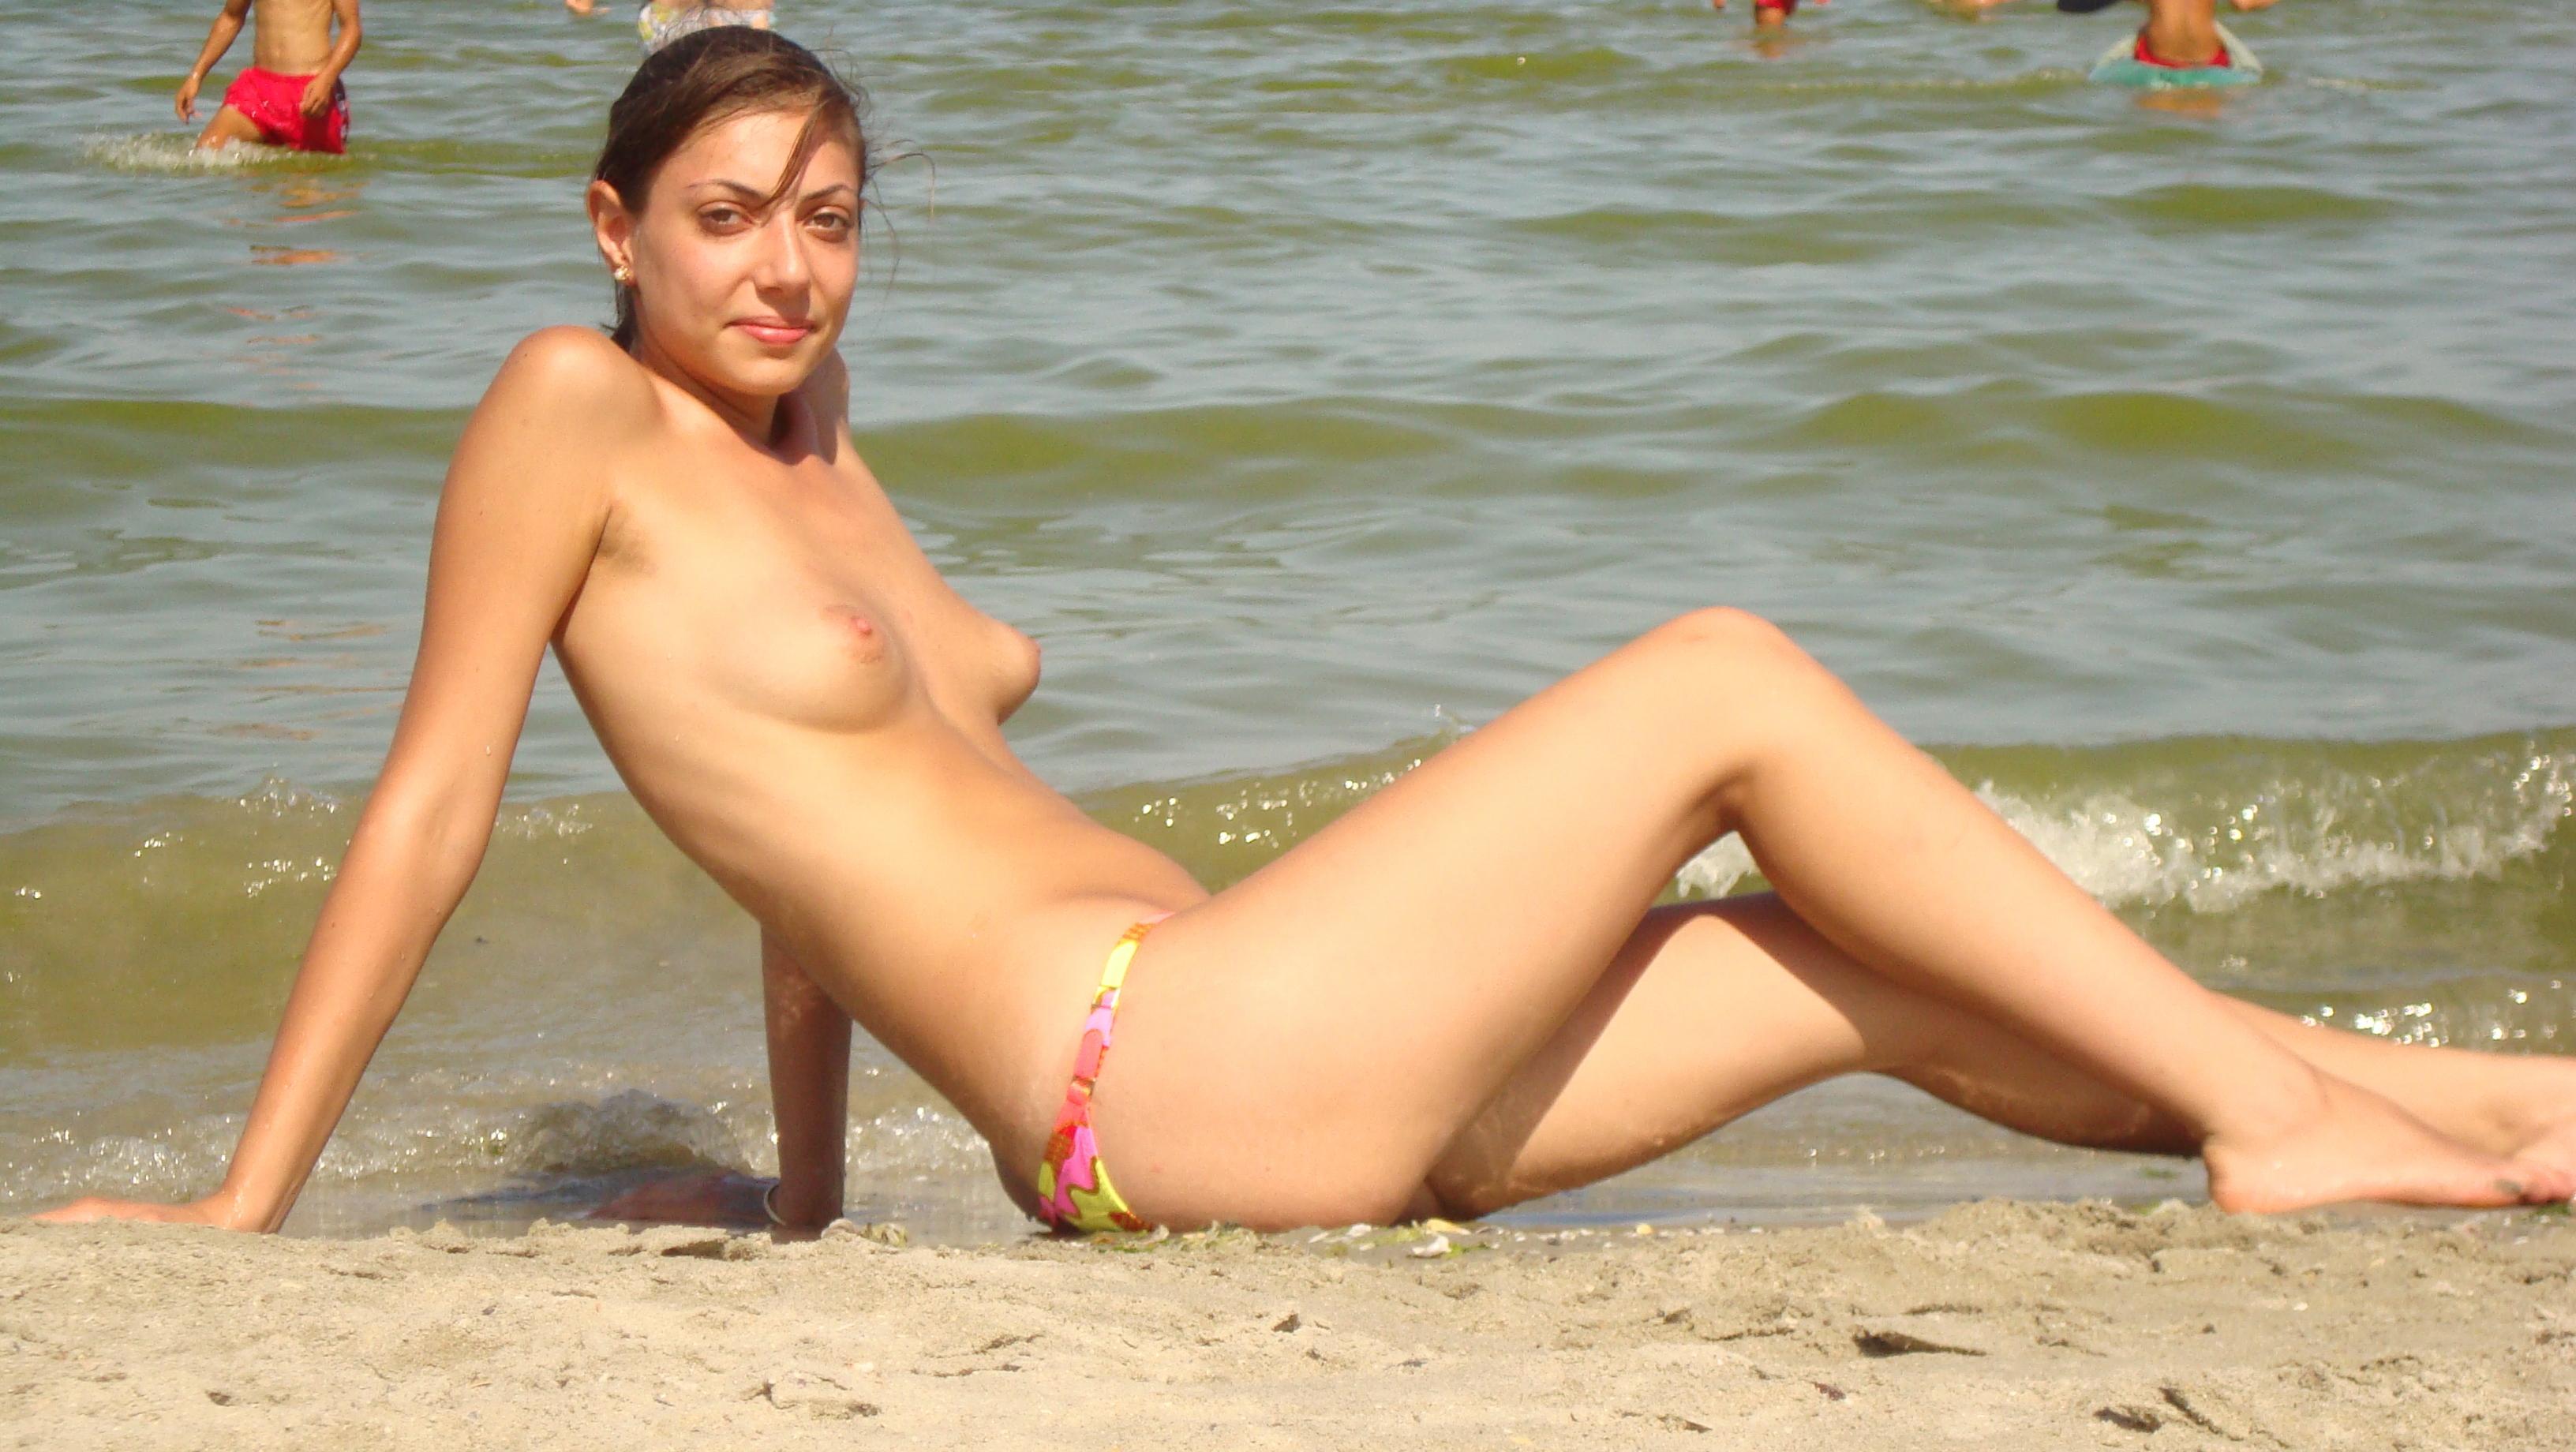 naked women vidio games